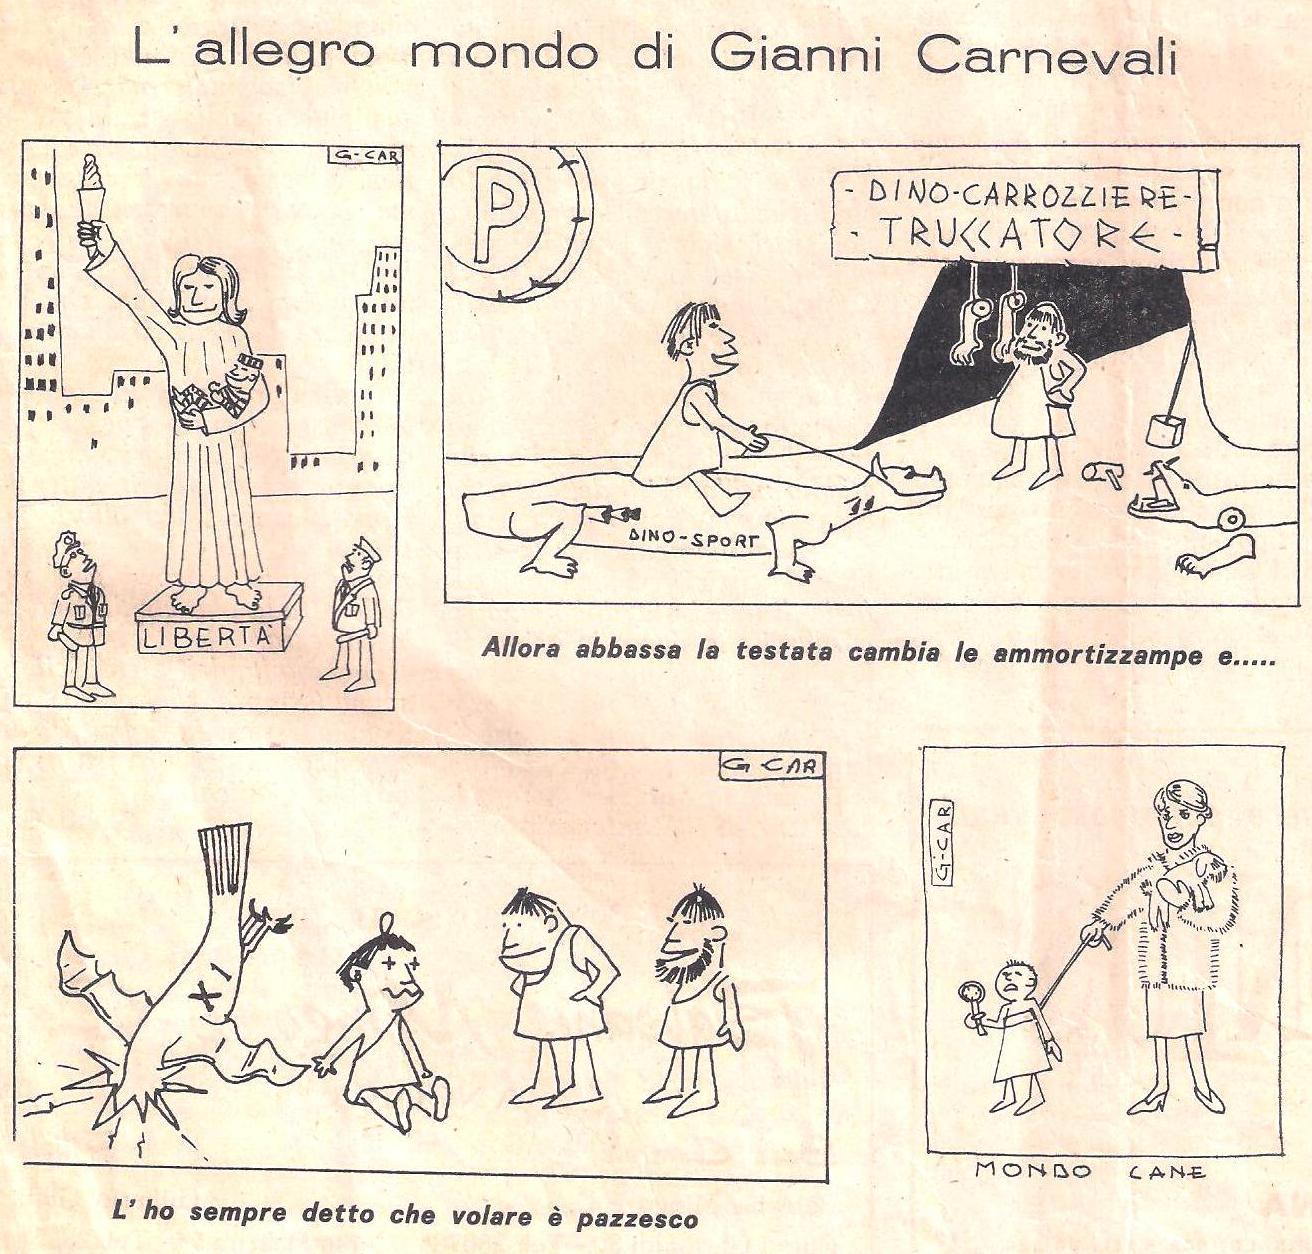 Carnevali 1 001